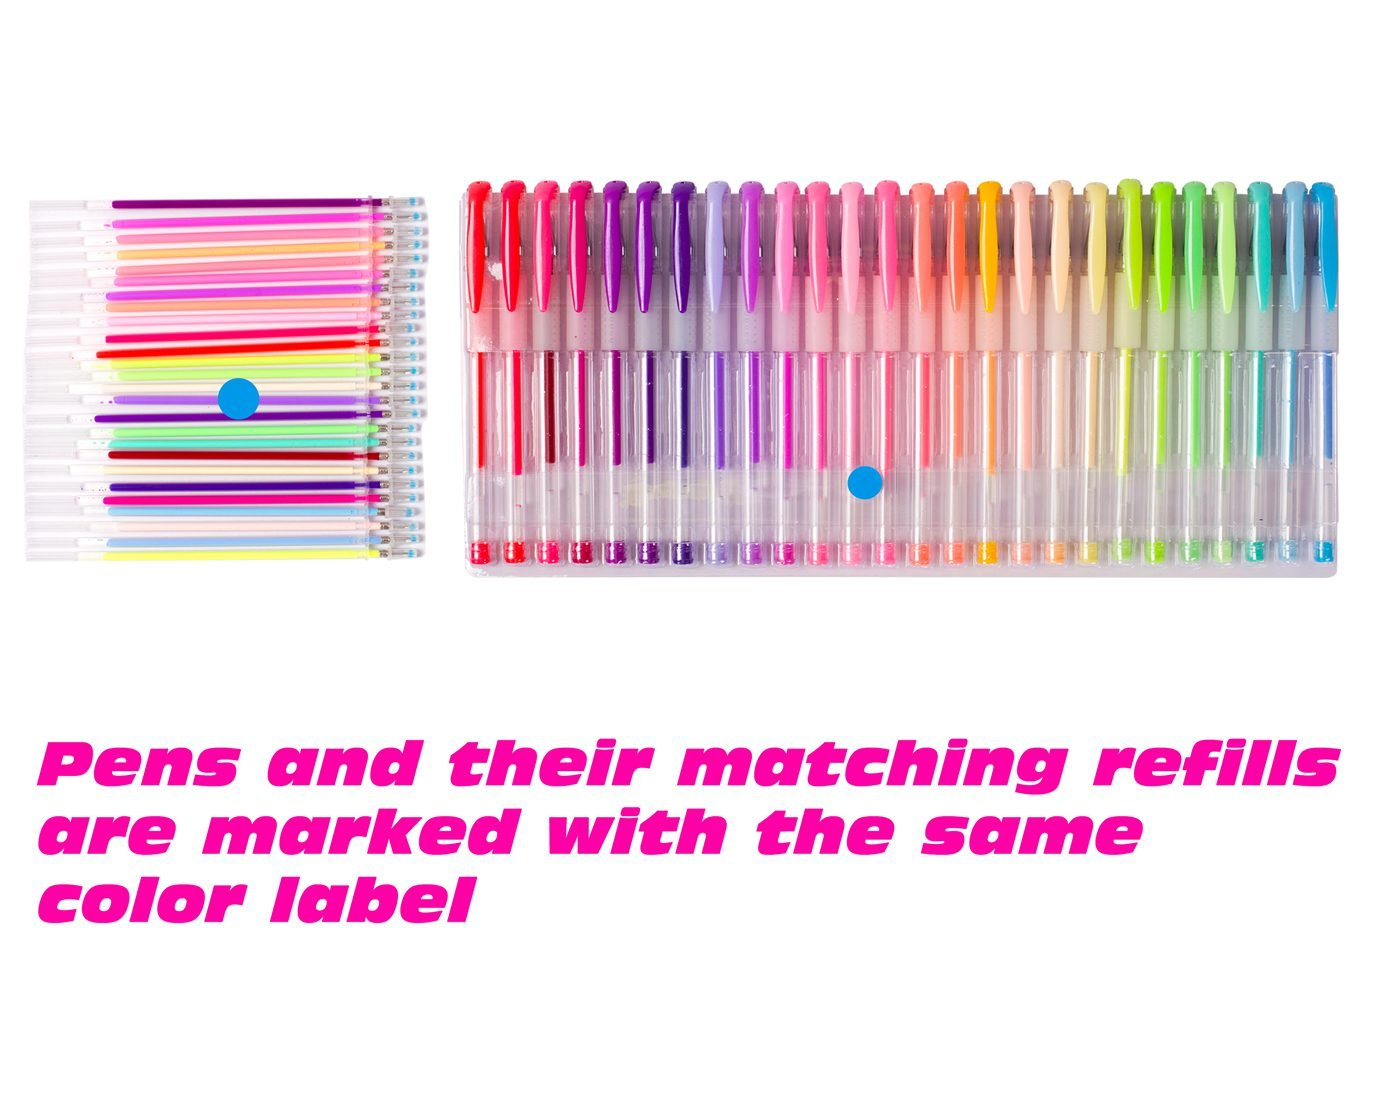 Shuttle Art 260 Colors Gel Pens Set 220% Ink Gel Pen for Adult Coloring Books Art Markers 130 Colored Gel Pens Plus 130 Refills by Shuttle Art (Image #3)